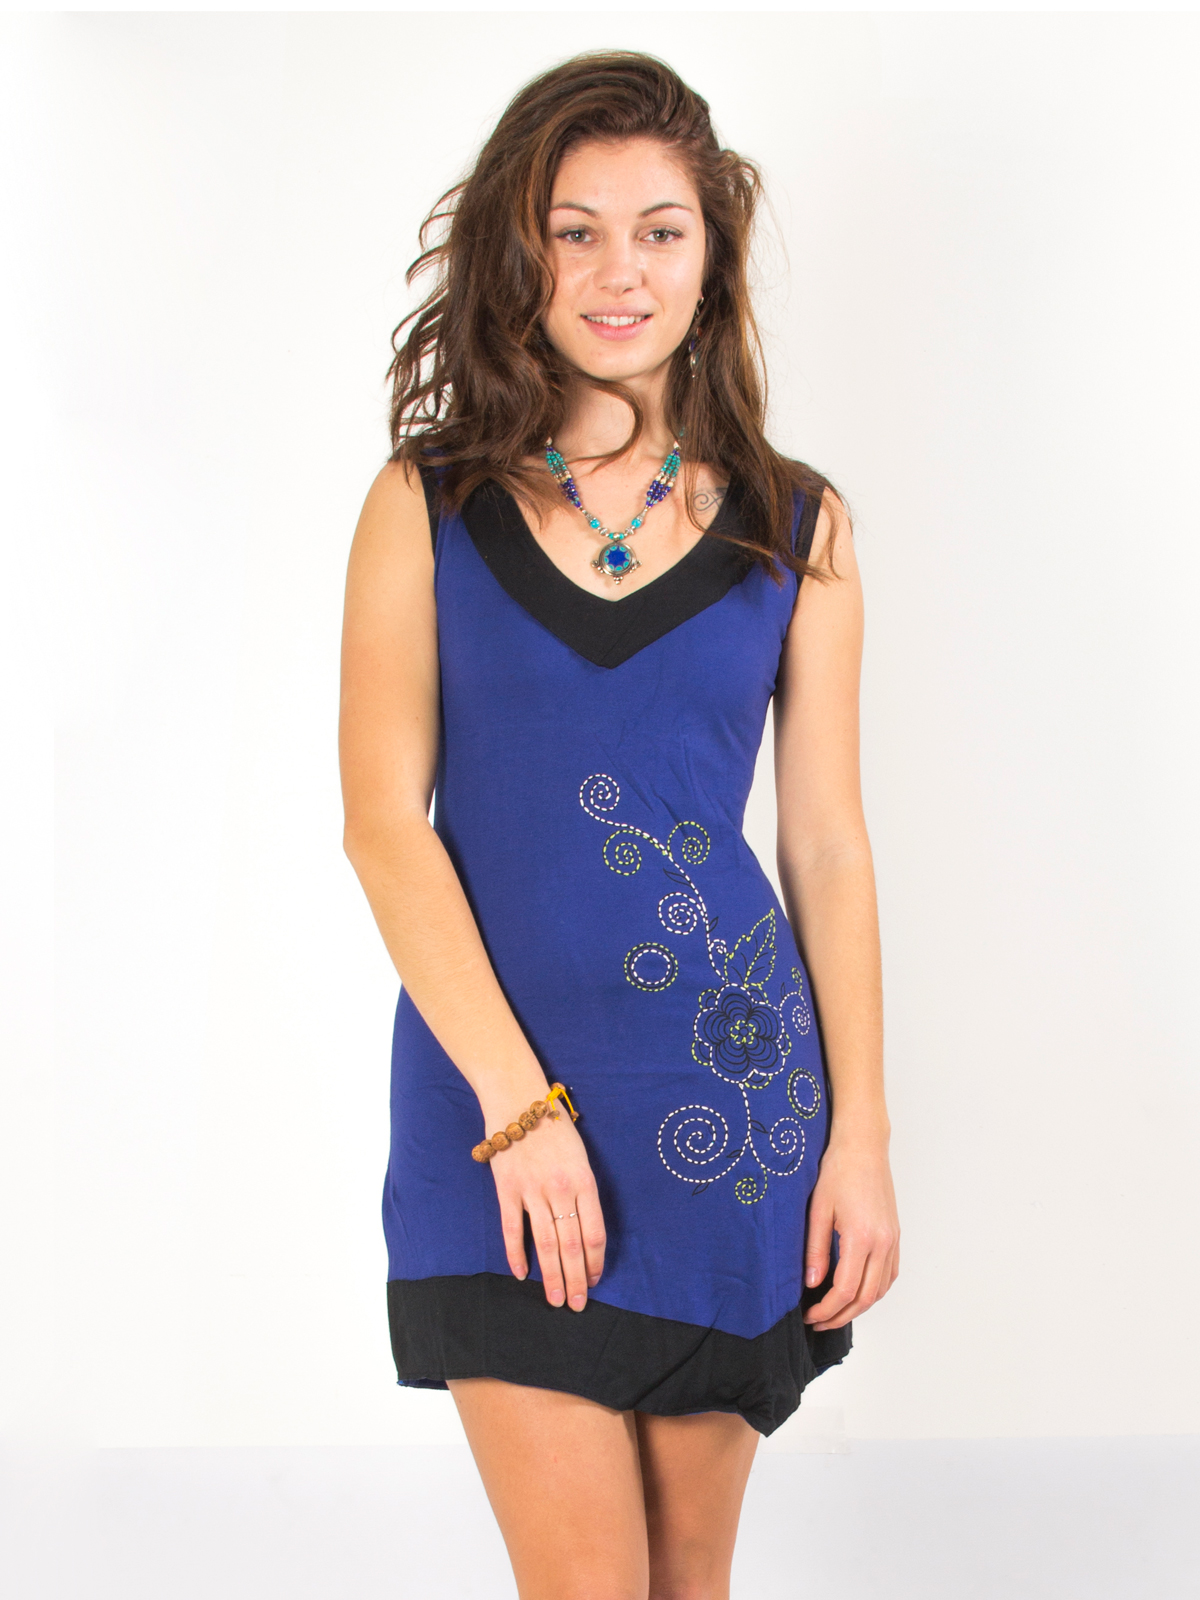 fea812b8222 Robe bleu coupe elfique broderie fleurie